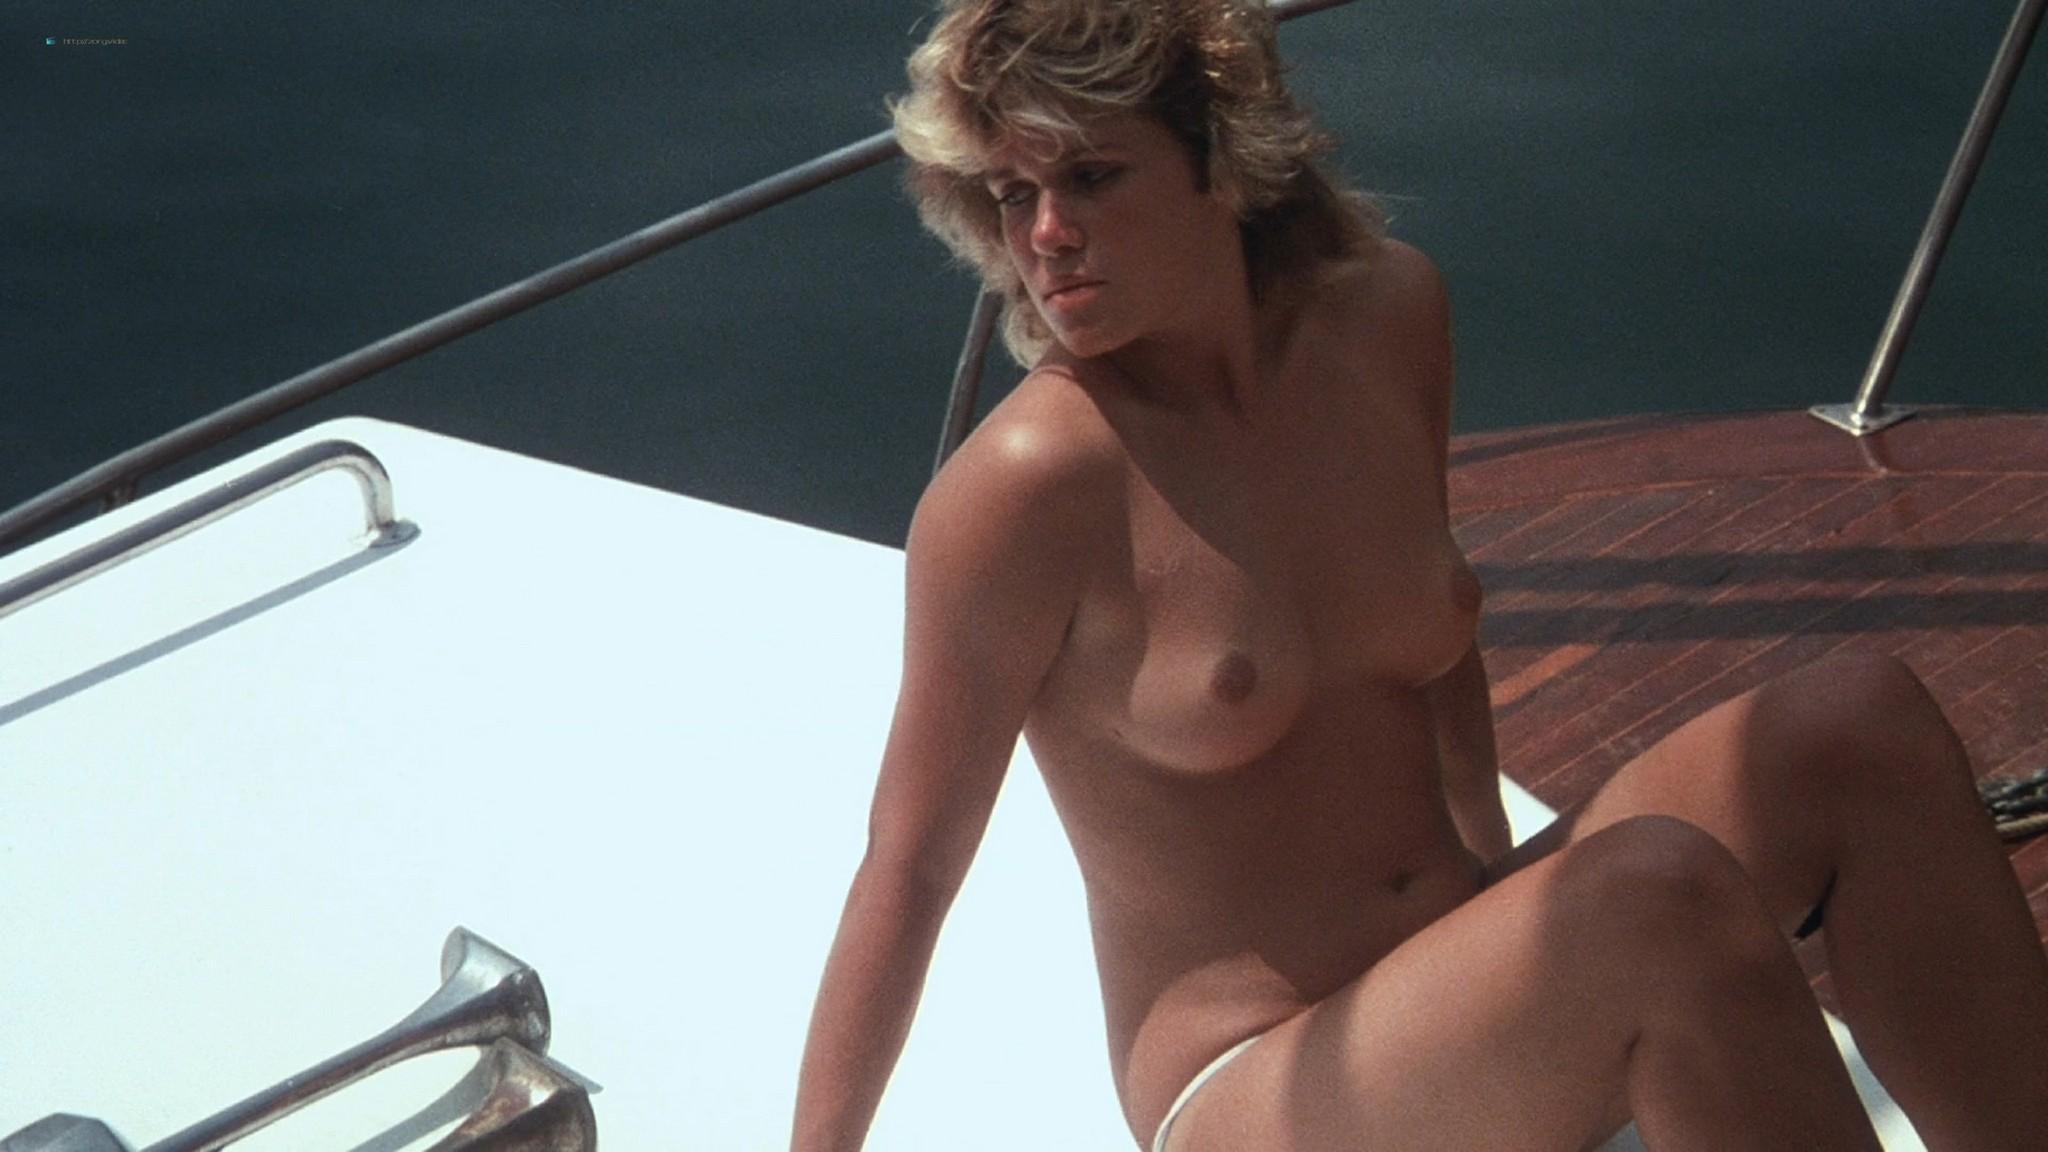 Belinda Mayne nude full frontal - White Fire (1984) HD 1080p BluRay (14)